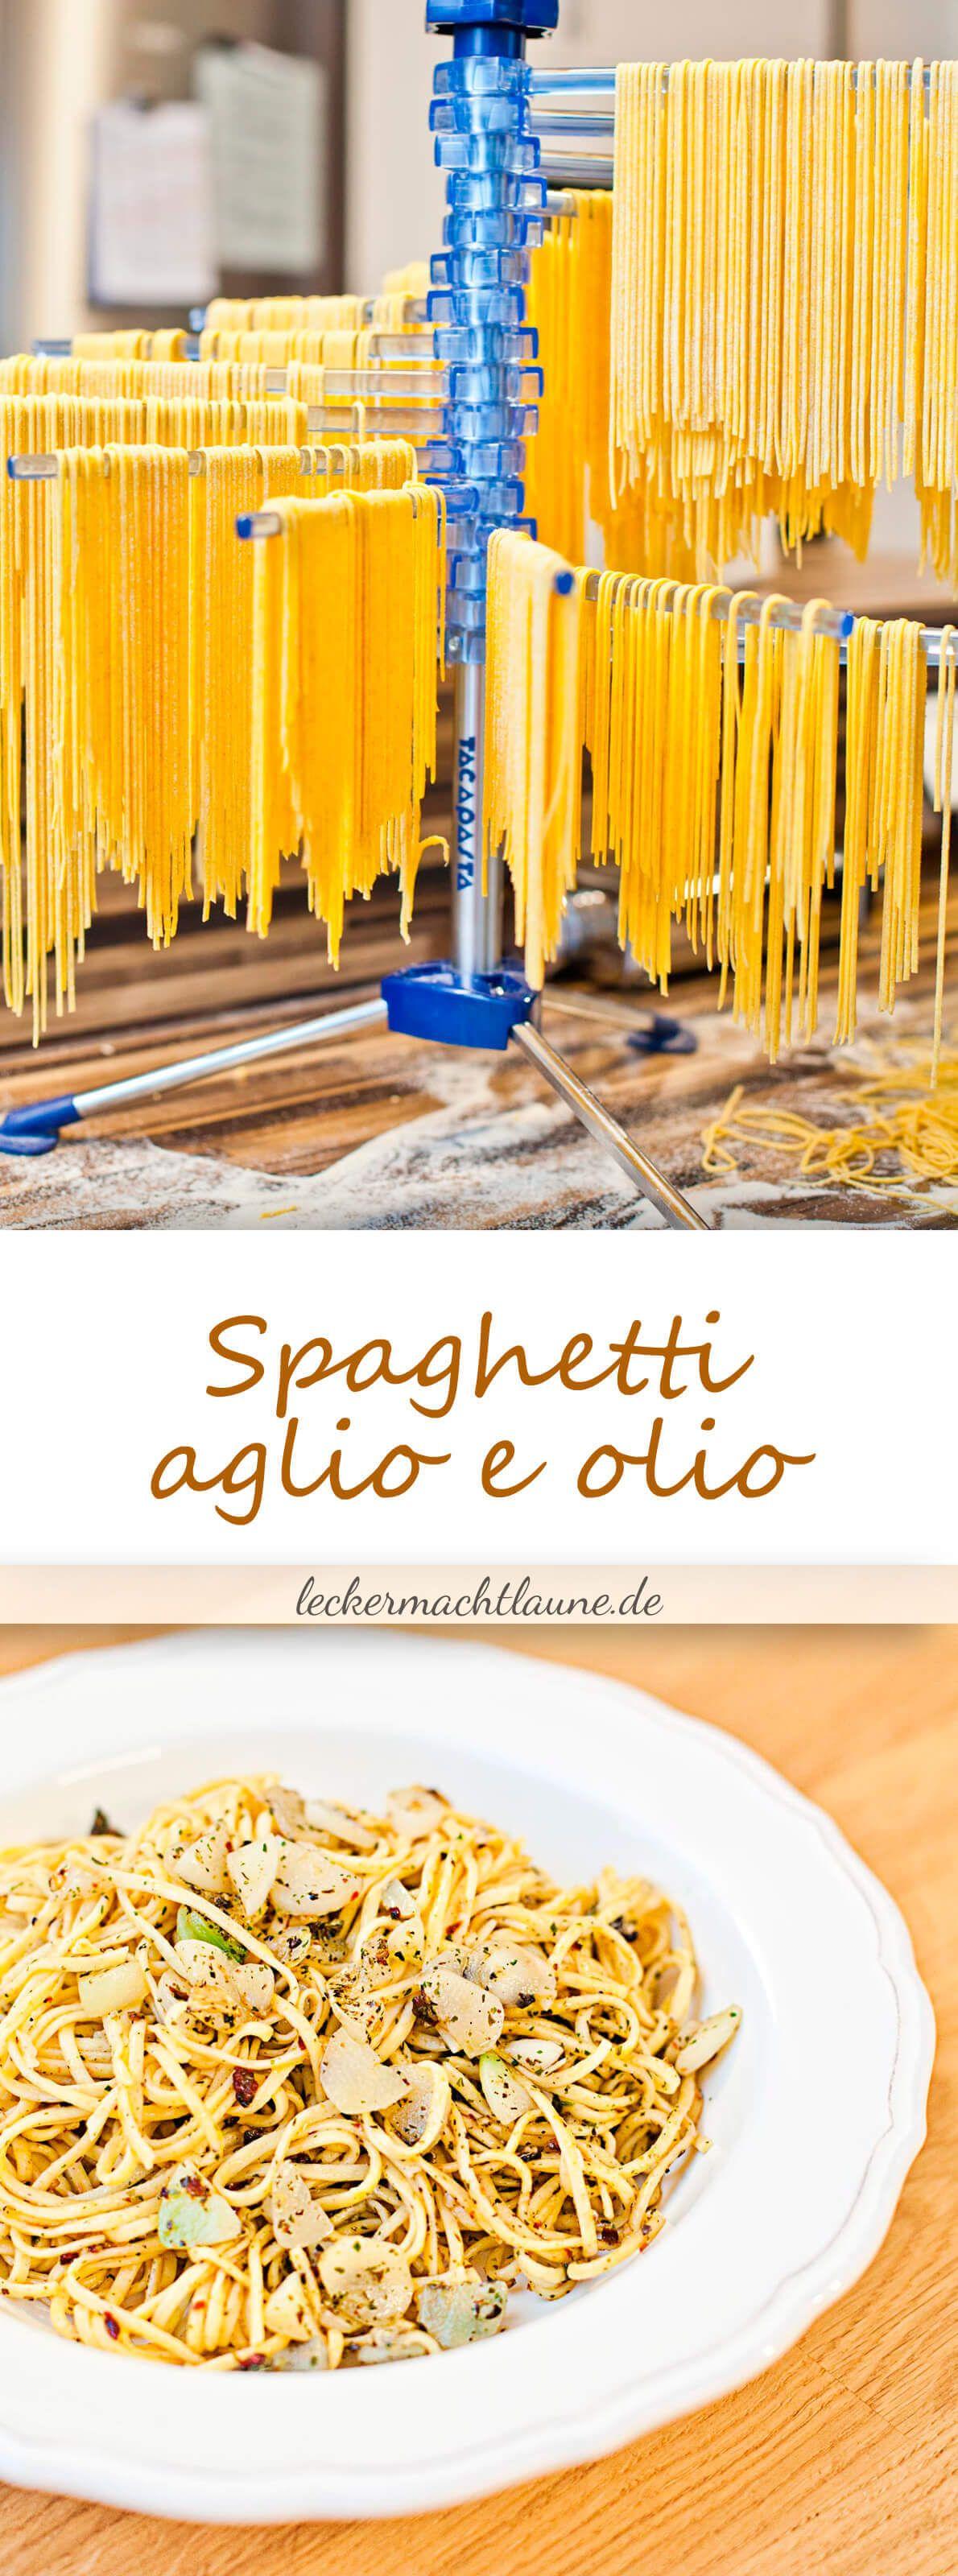 hausgemachte spaghetti aglio e olio lieblingsessen goldener blogger herbst pinterest. Black Bedroom Furniture Sets. Home Design Ideas